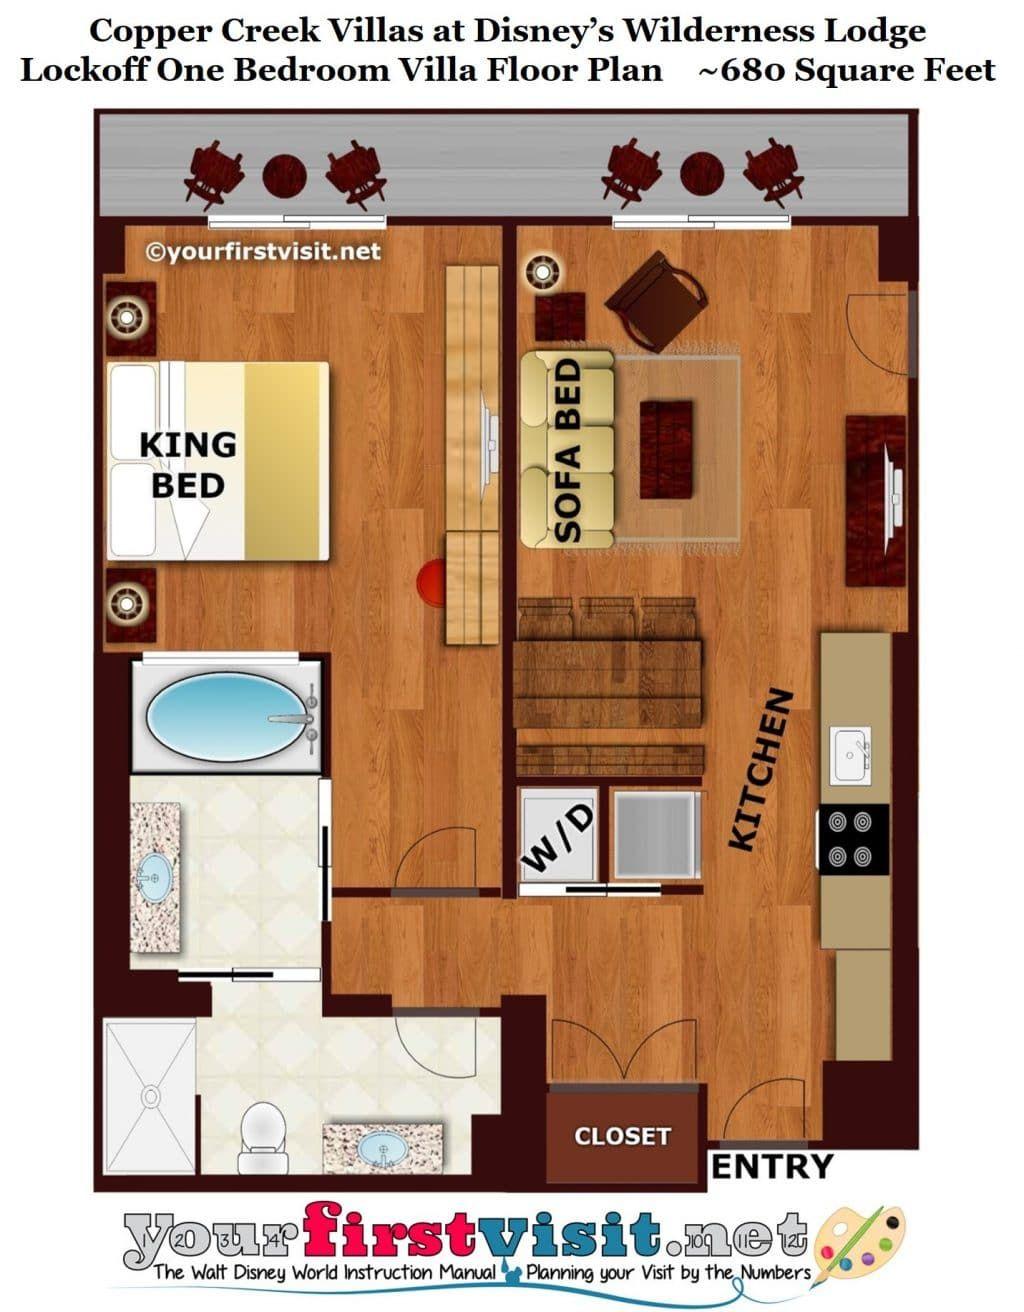 The Living Dining Kitchen Space Of One And Two Bedroom Villas At Disney S Copper Creek Villas Yourfirstvisit Net Copper Creek Beach Floor Plans Brick Wallpaper Bedroom